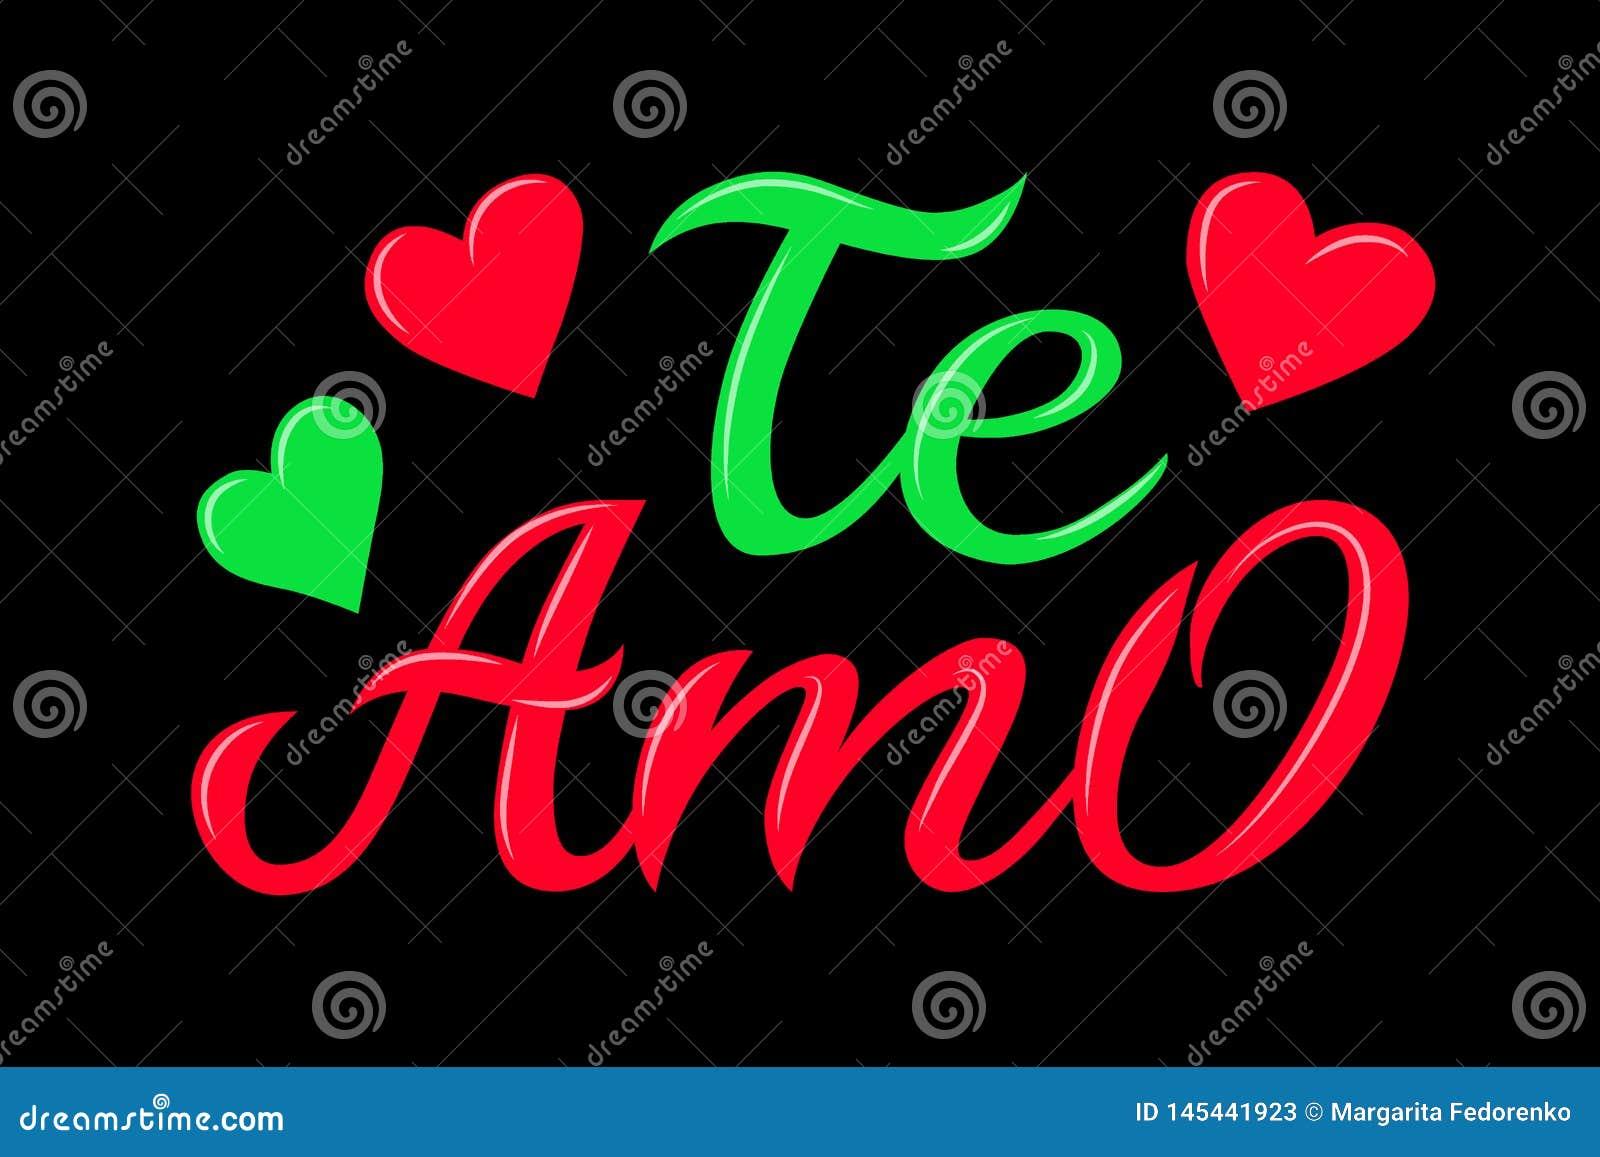 Eres El Amor De Mi Vida Denis Te Amo Poster Chofis Keep Calm O